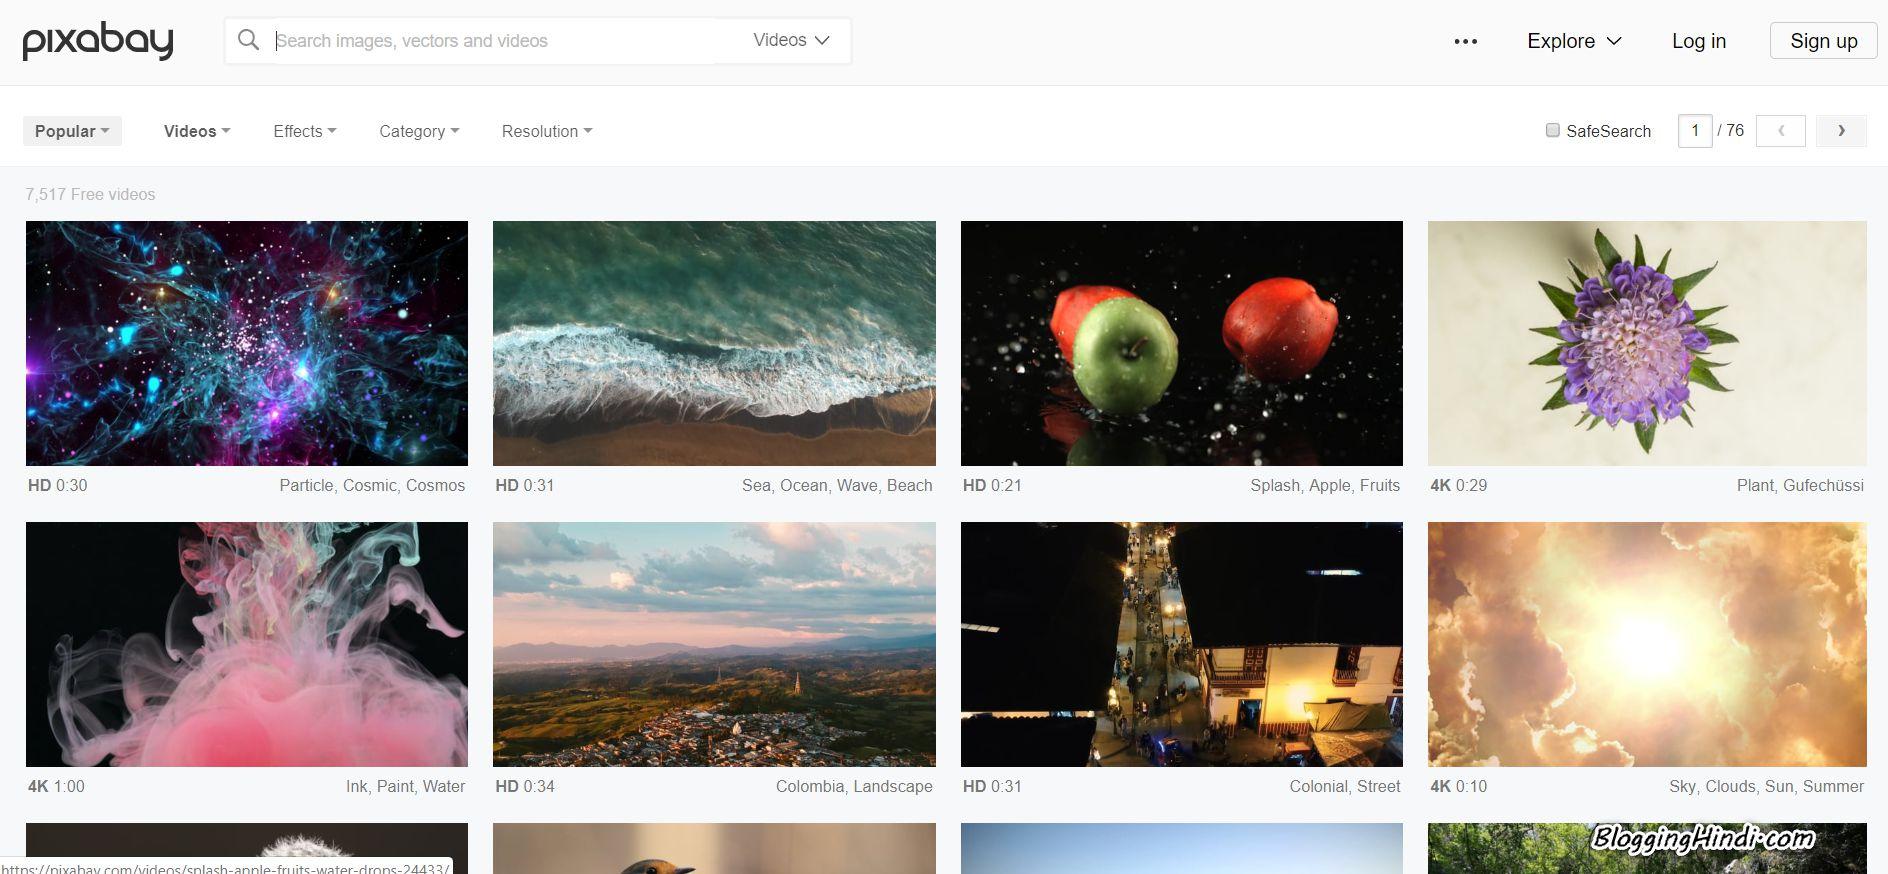 YouTube Ke Liye Creative Common Video Download Kaha Se Kare? Top 5 Websites 3